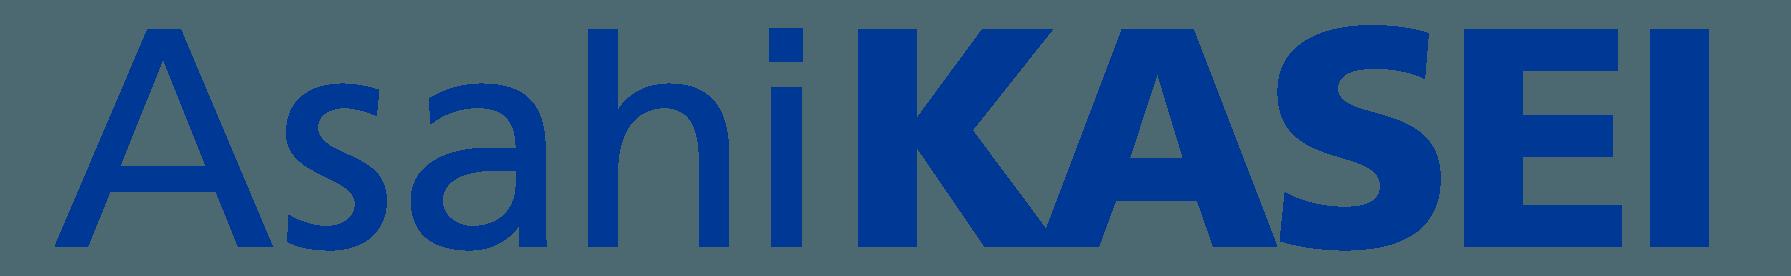 Asahi_Kasei_logo